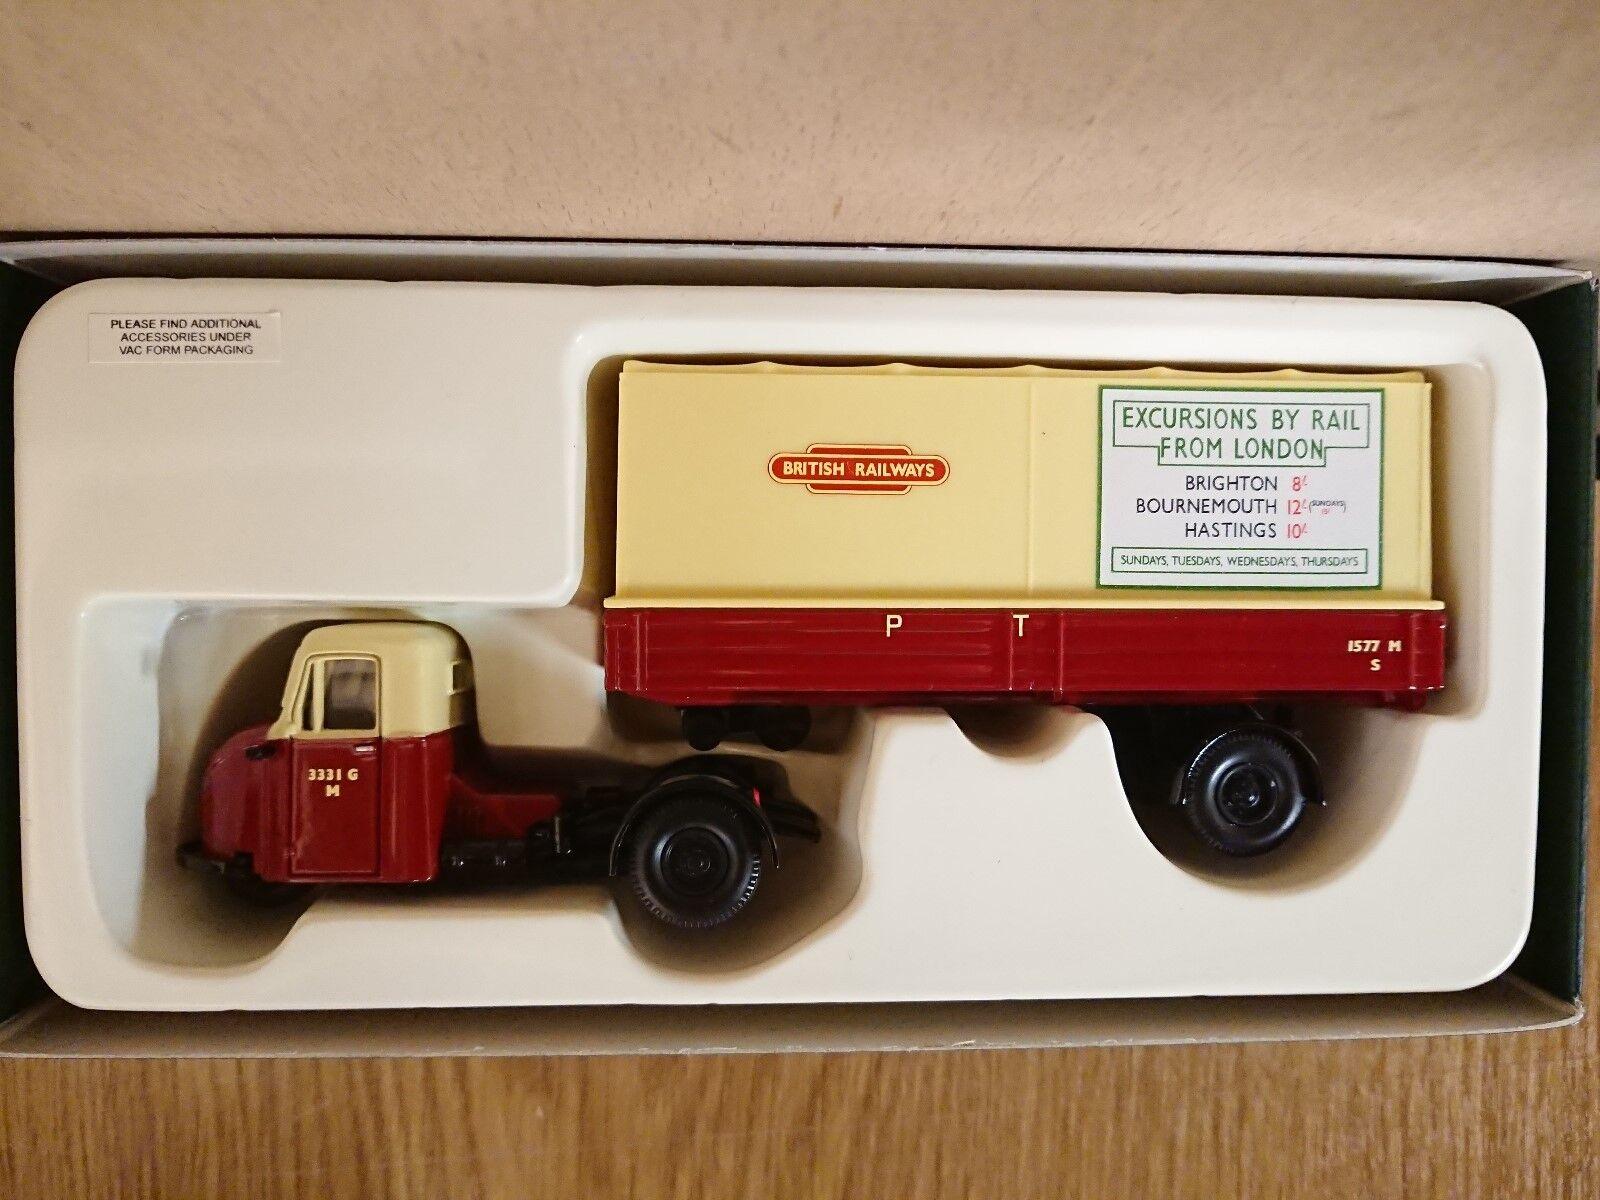 Corgi CC11301 Scammell Scarab British Rail Ltd Ed No. 0933 of 2000